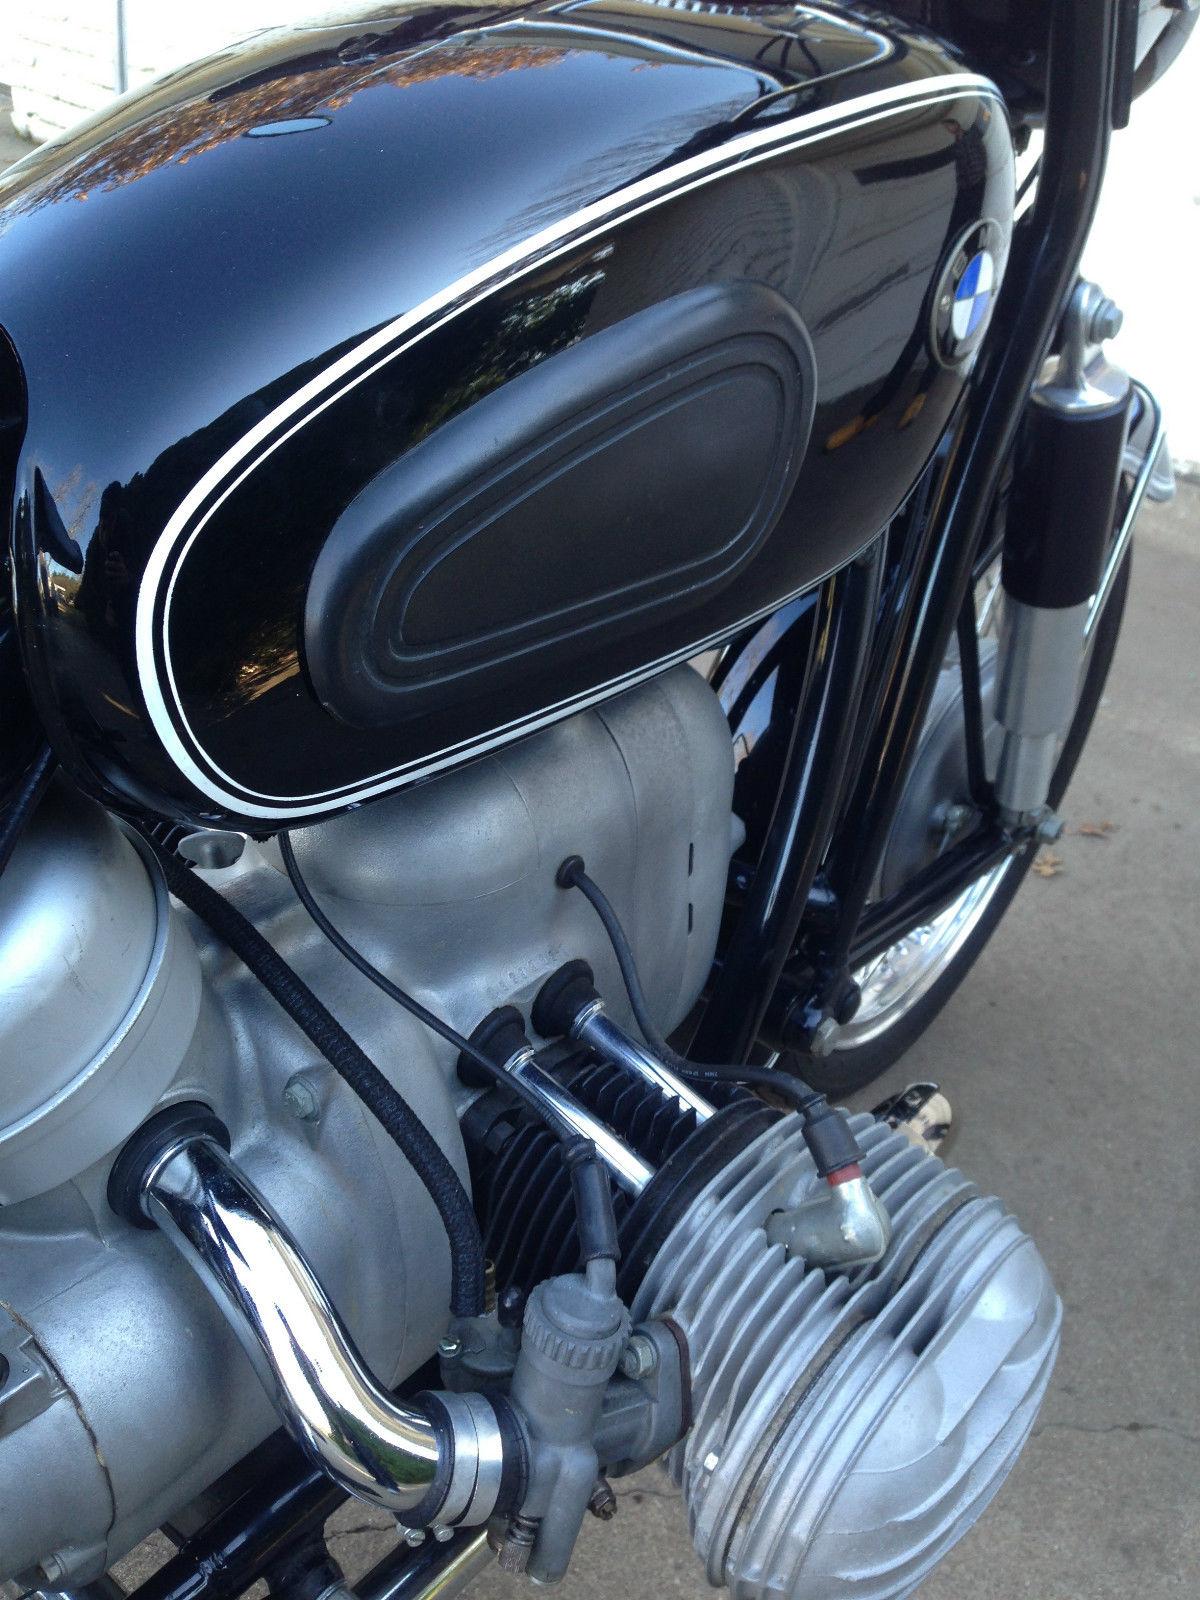 BMW R60/2 - 1967 - Knee Pad, Pin Stripes, Push Rod Tubes and Engine.